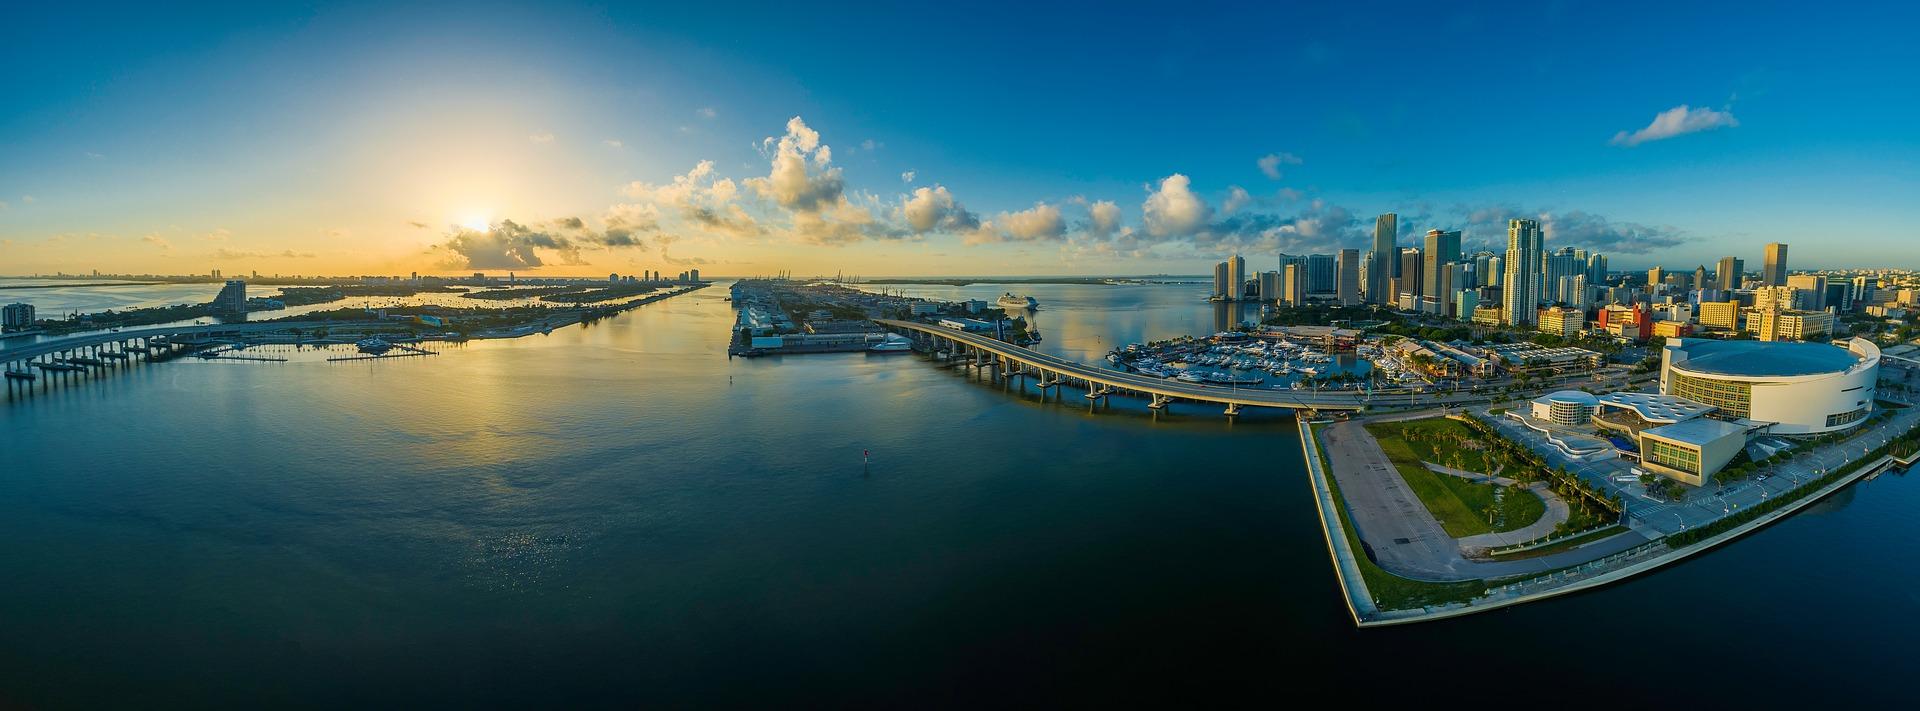 Autoreis; het prachtige Florida